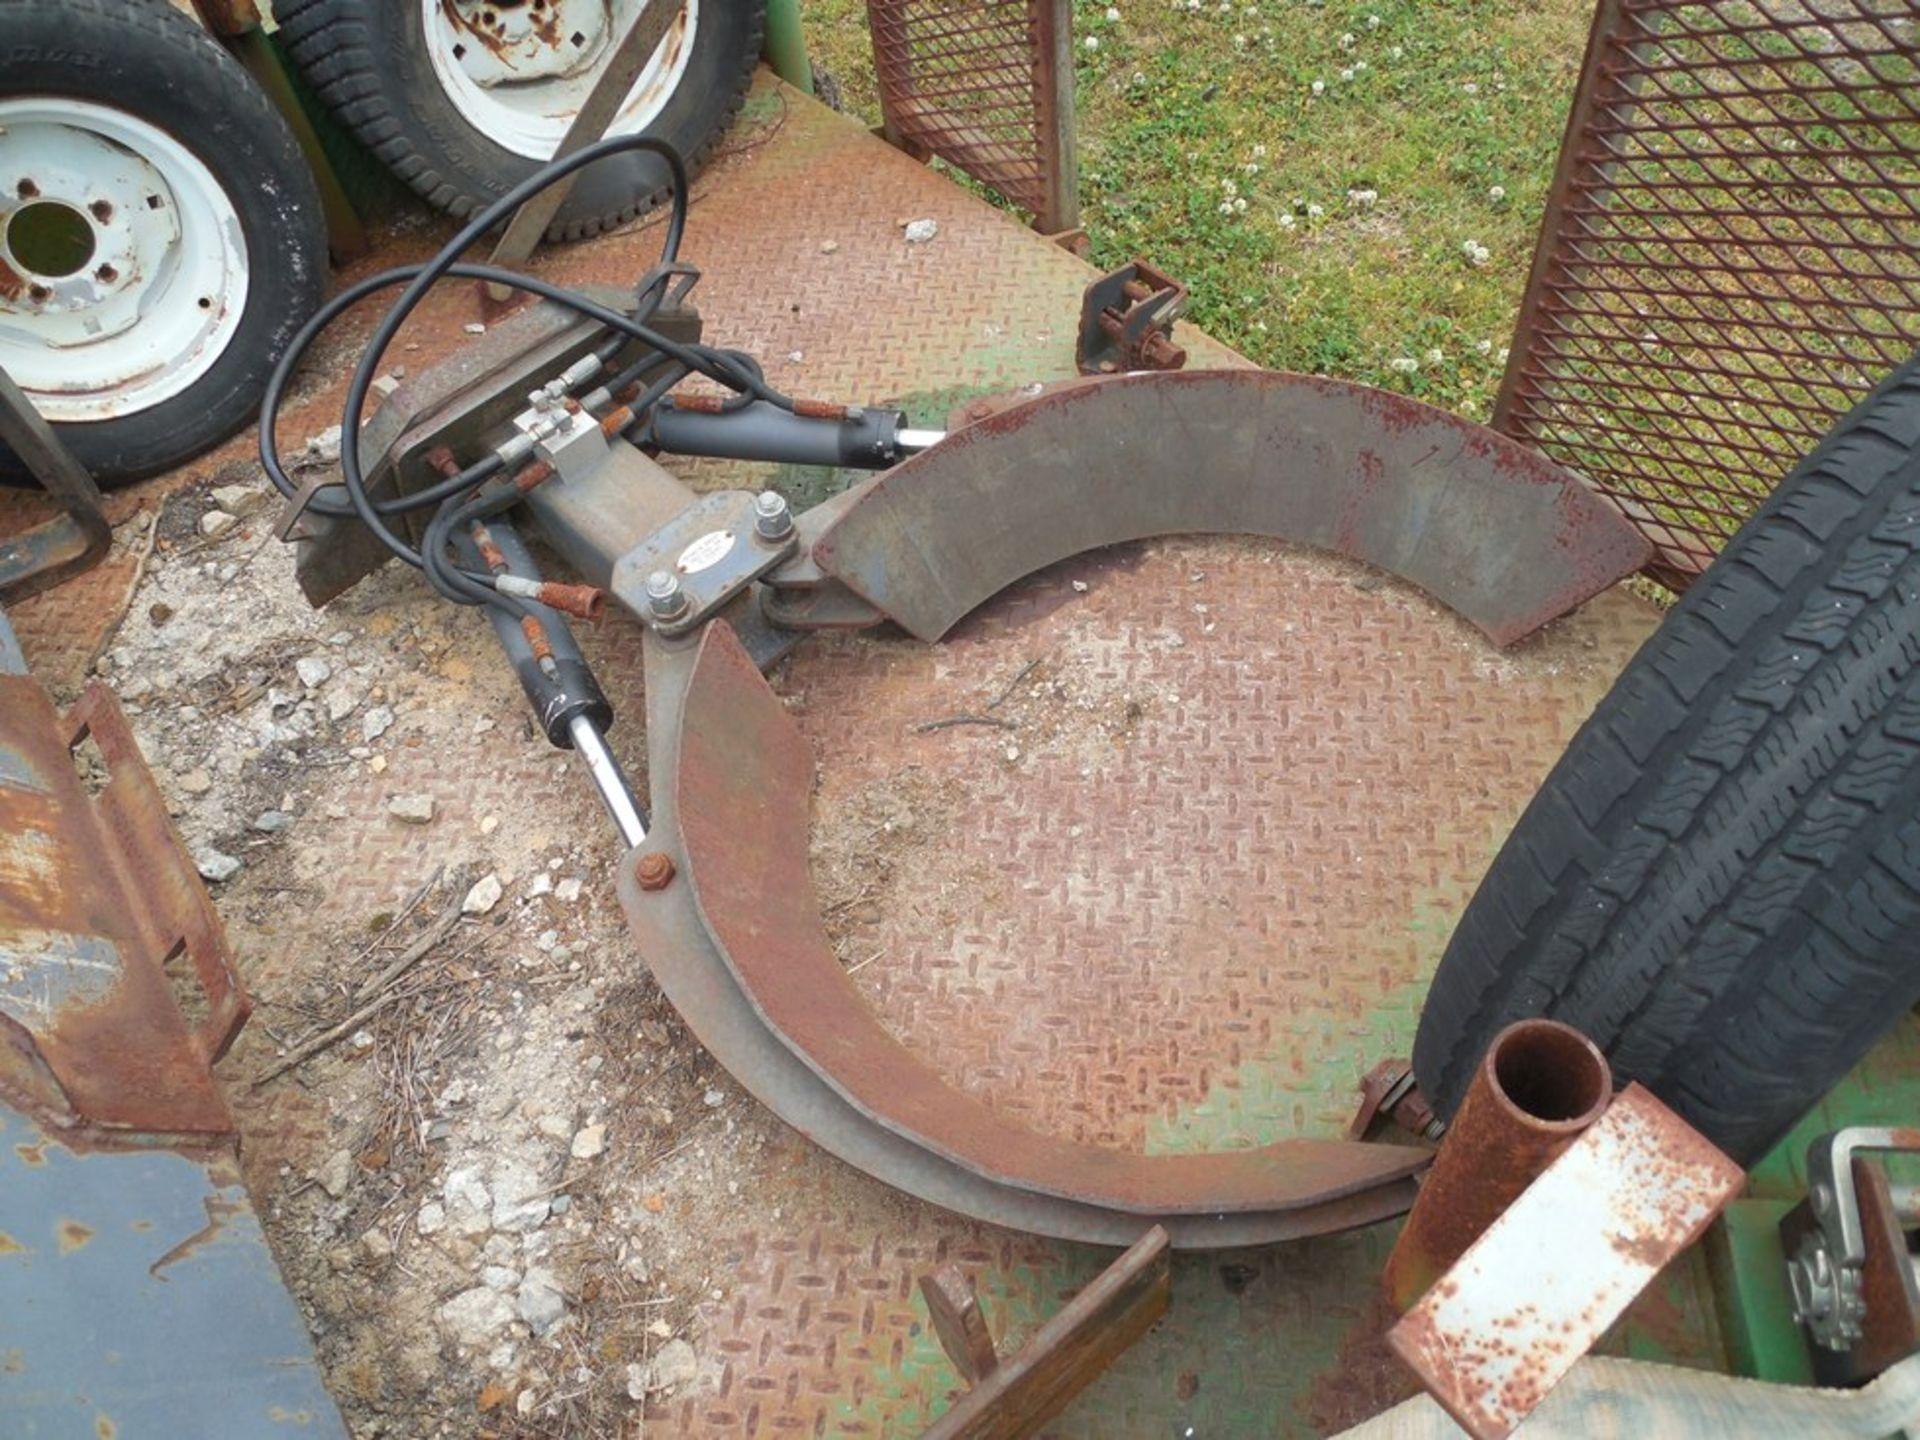 Power Trac PT-2425 Mini Skid Steer ser# 18928 with trailer, power rake, tree spade, front bucket, - Image 11 of 13